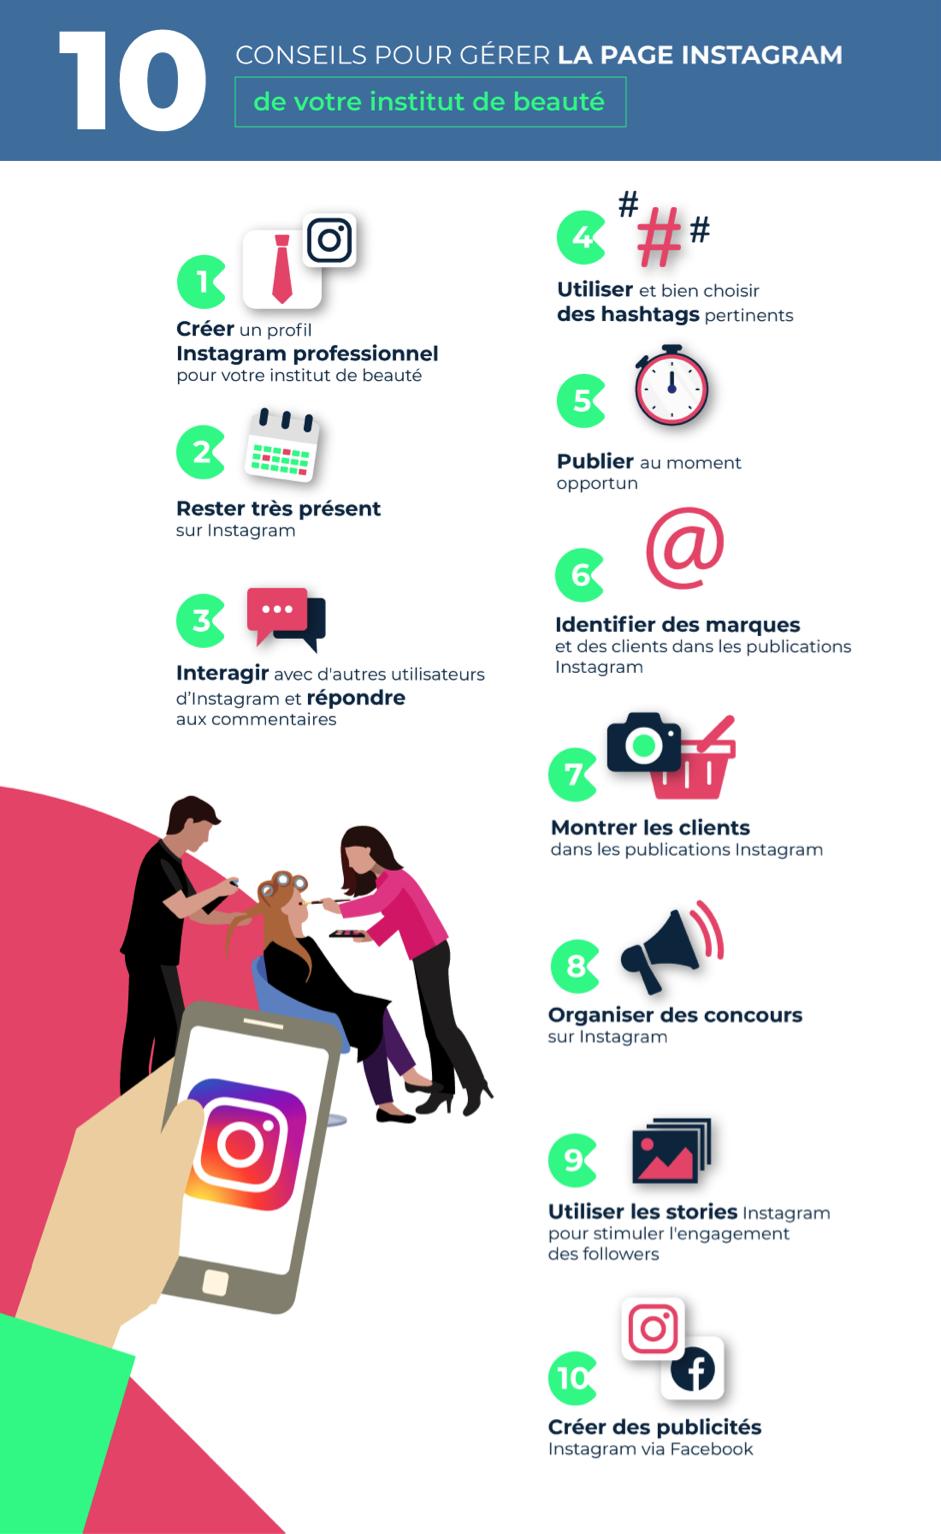 comment gérer page instagram conseils infographie